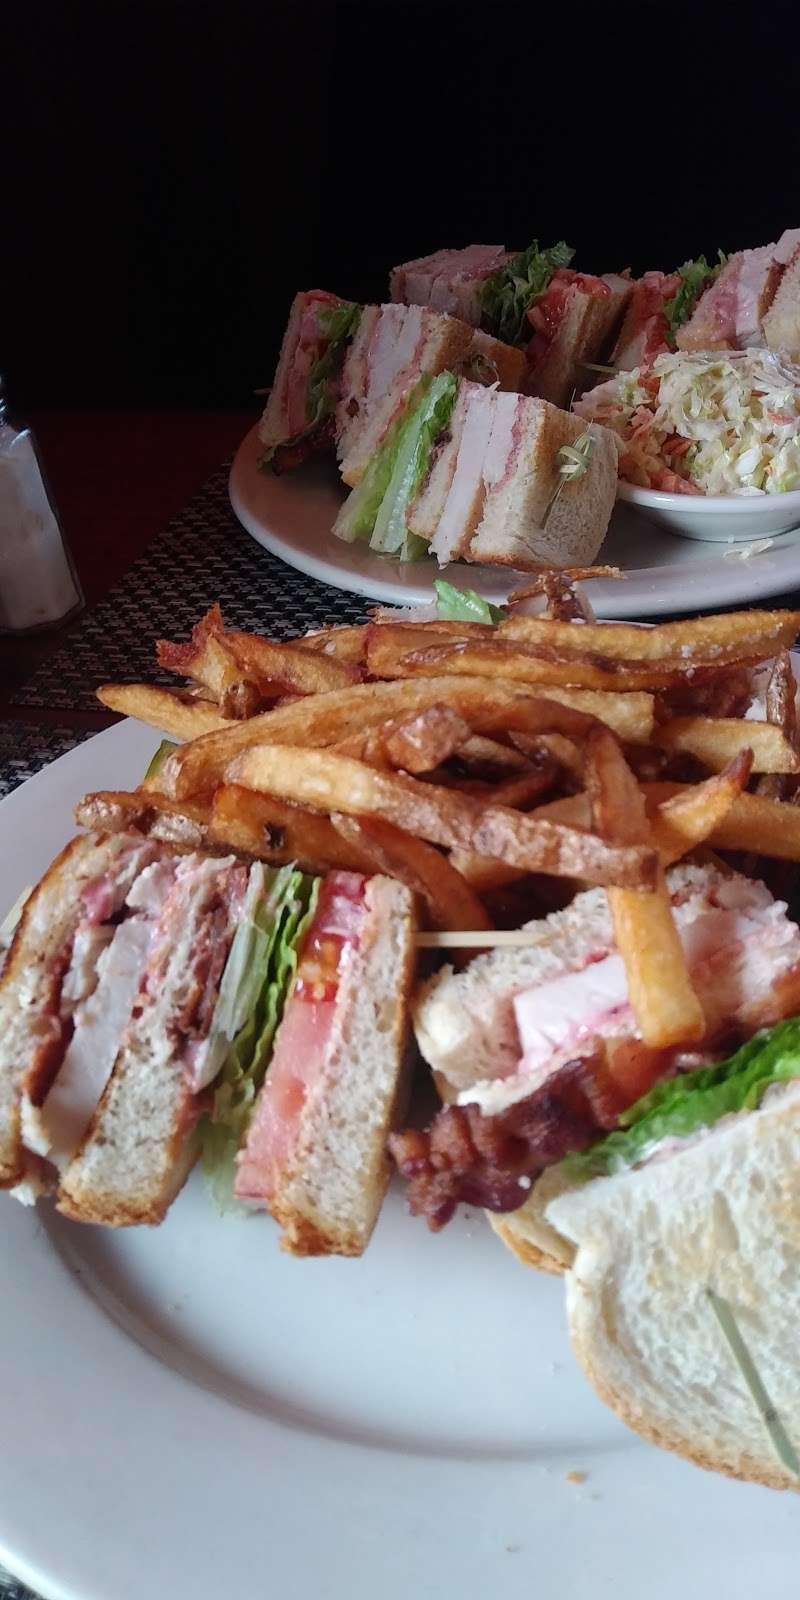 The Village Tavern - restaurant  | Photo 4 of 10 | Address: 90 Hartford Pike, North Scituate, RI 02857, USA | Phone: (401) 764-0893